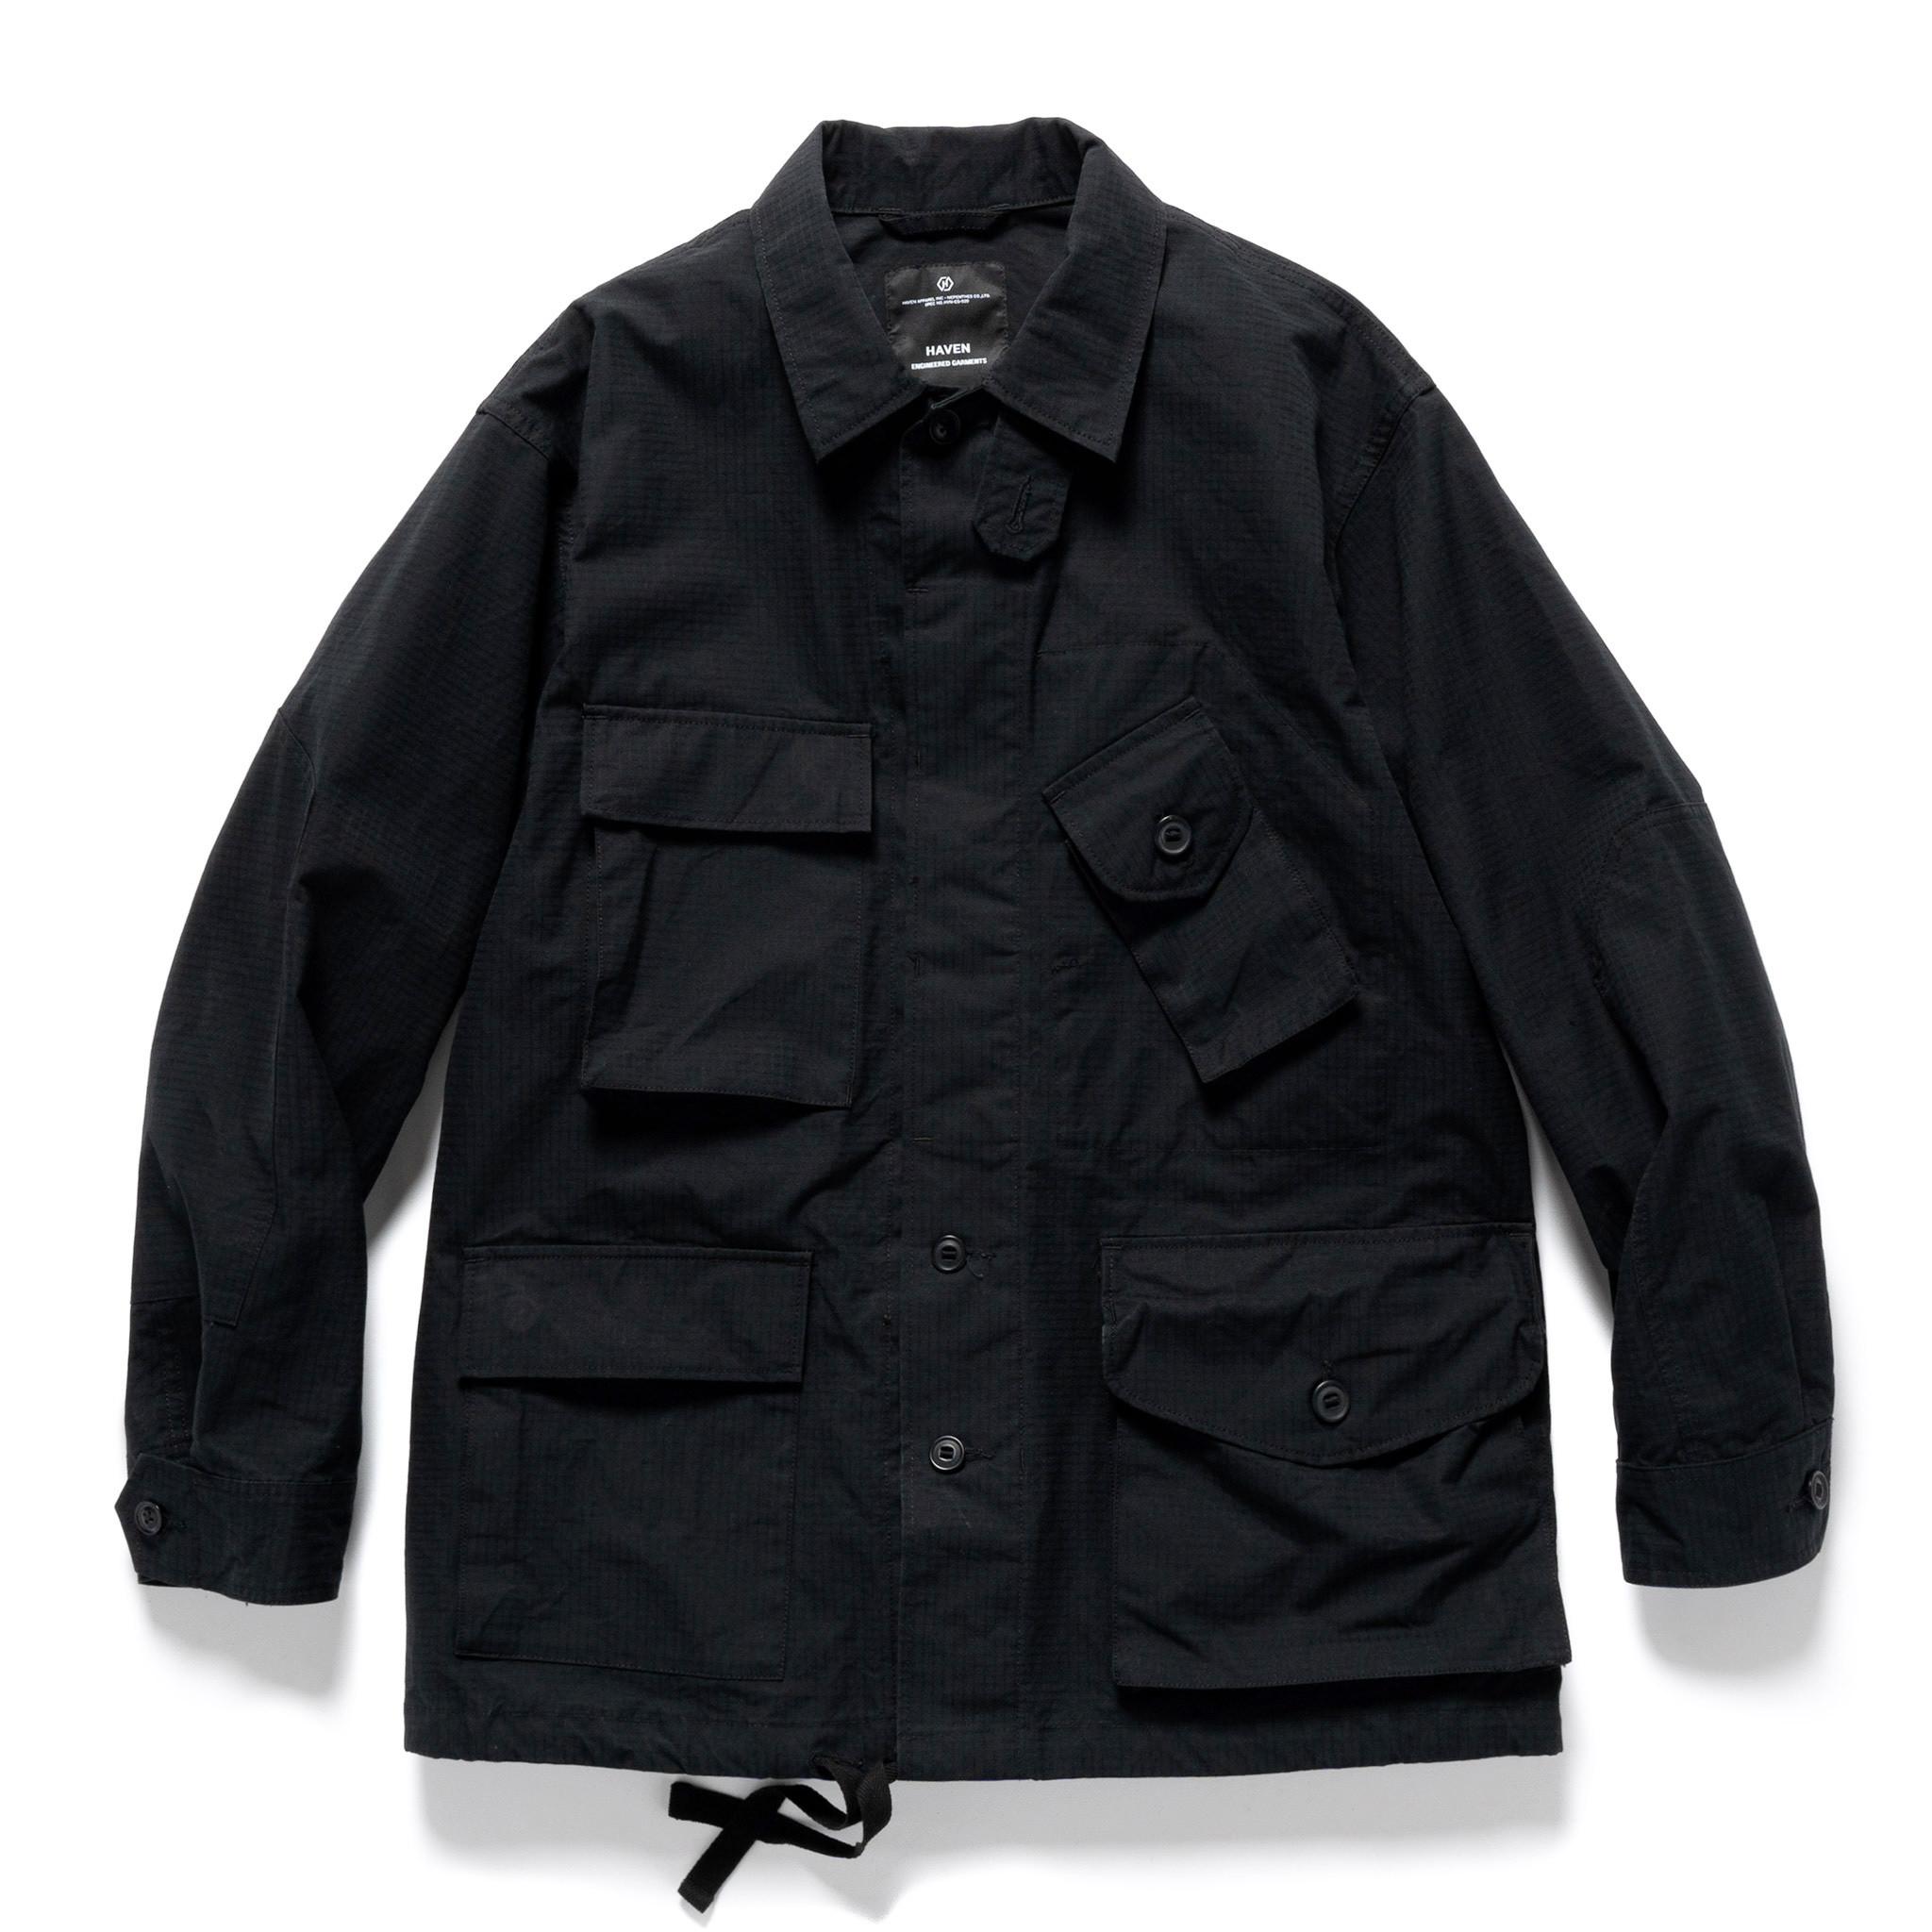 Engineered Garments BDU Jacket for HAVEN - Black Ventile Ripstop